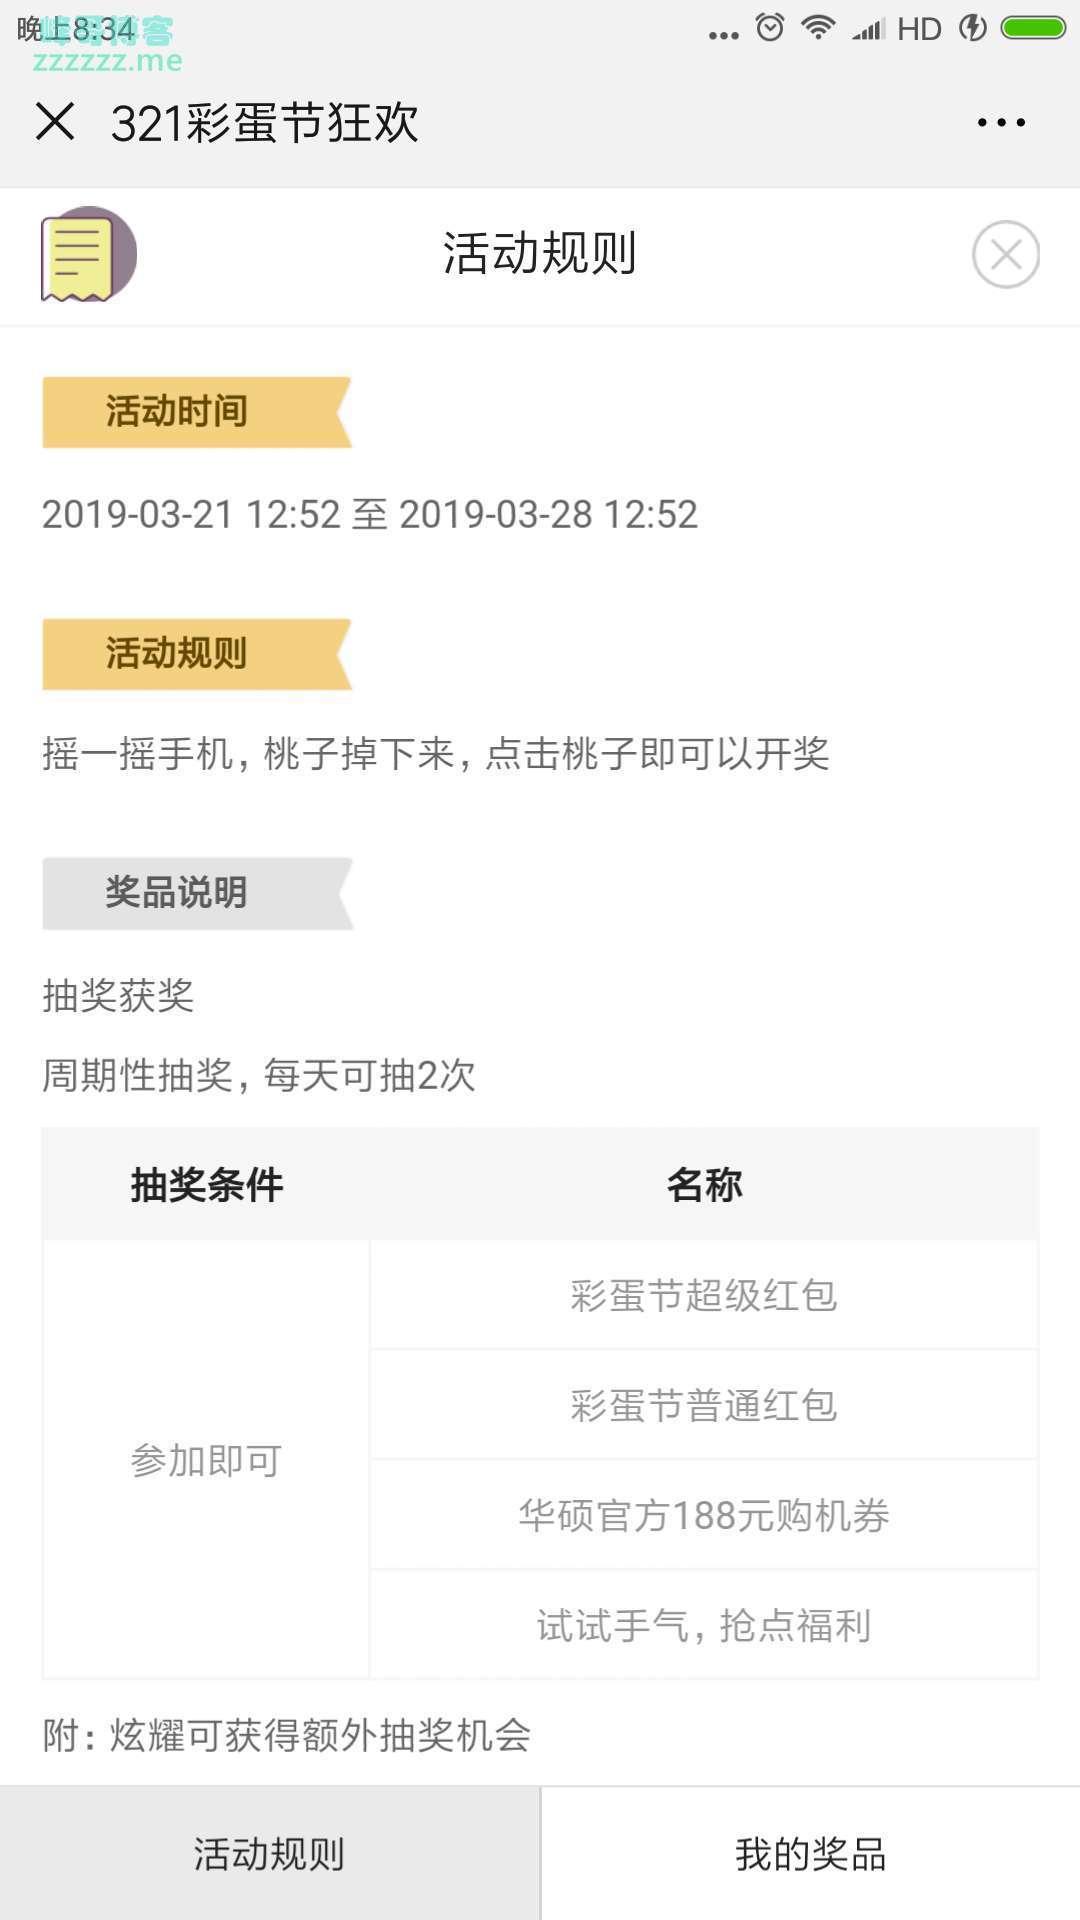 < ASUS华硕华东>321菜单节狂欢(截止3月28日)